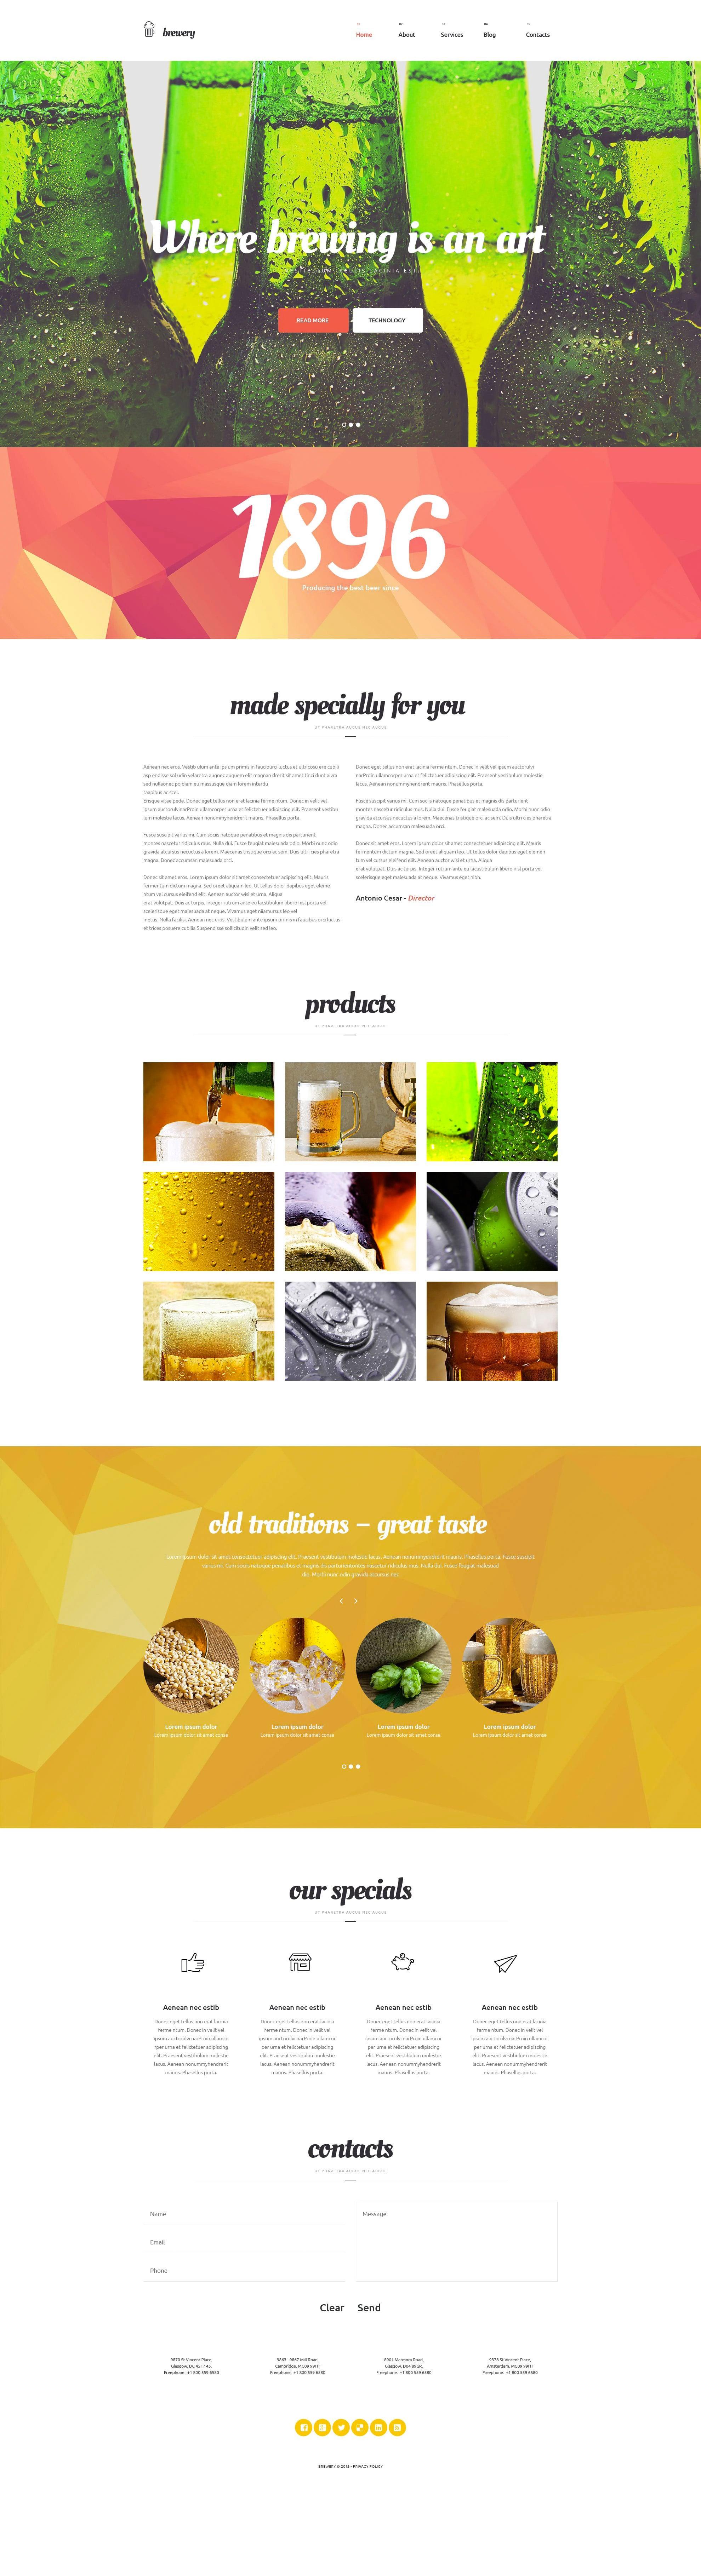 WordPress Food Blog Themes - 10 Premium WP Templates - Untitled 8